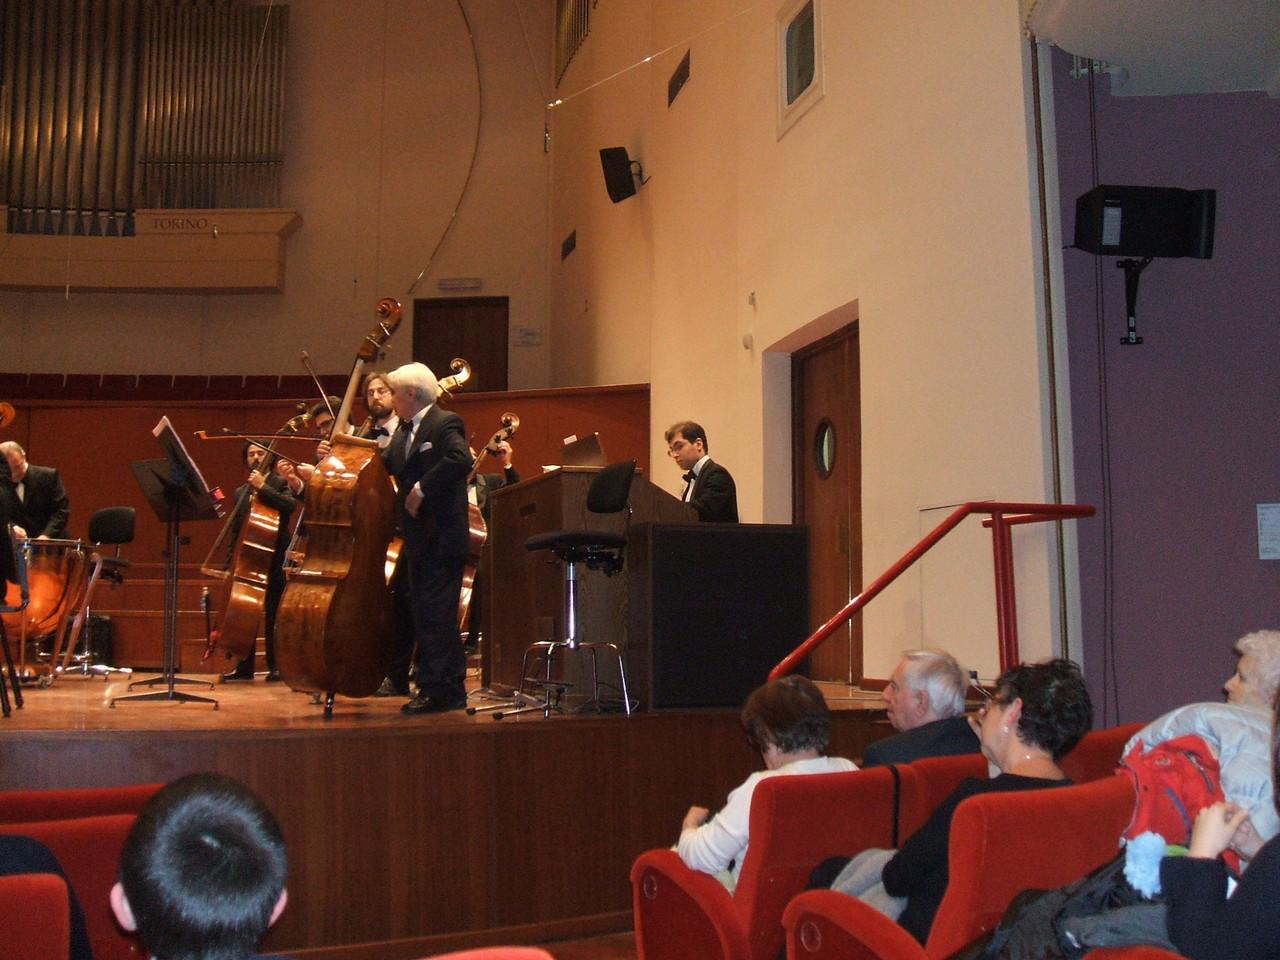 Auditorium Rai, Torino. National Symphony Orchestra (IT)